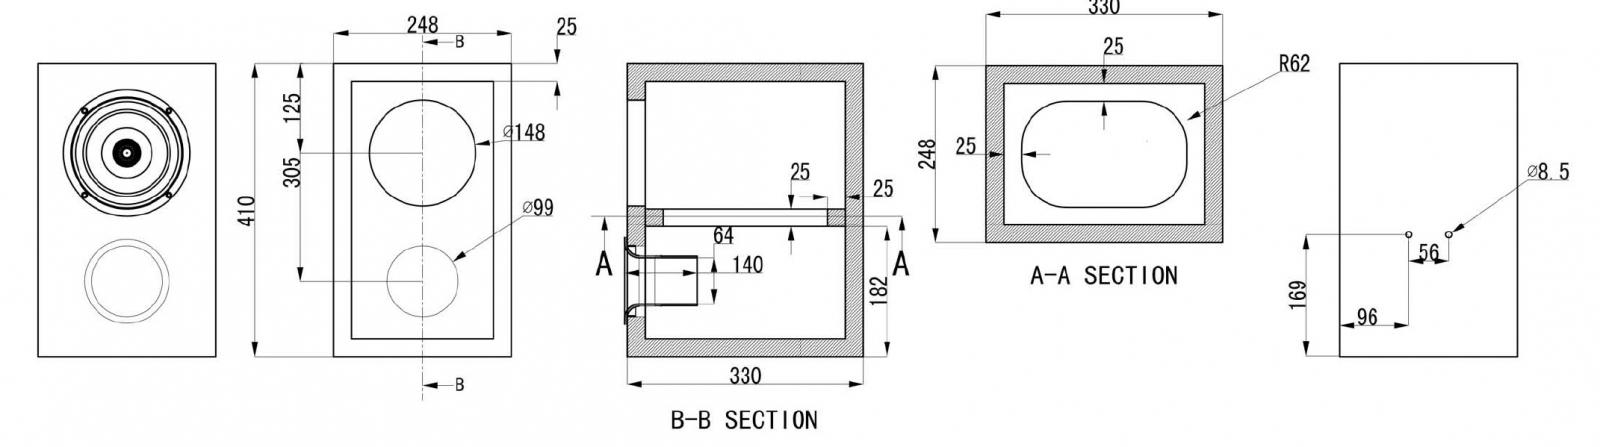 "SUG1-08 - 6.5"" Full Range Vented Bookshelf Enclosure Suggestion ..."